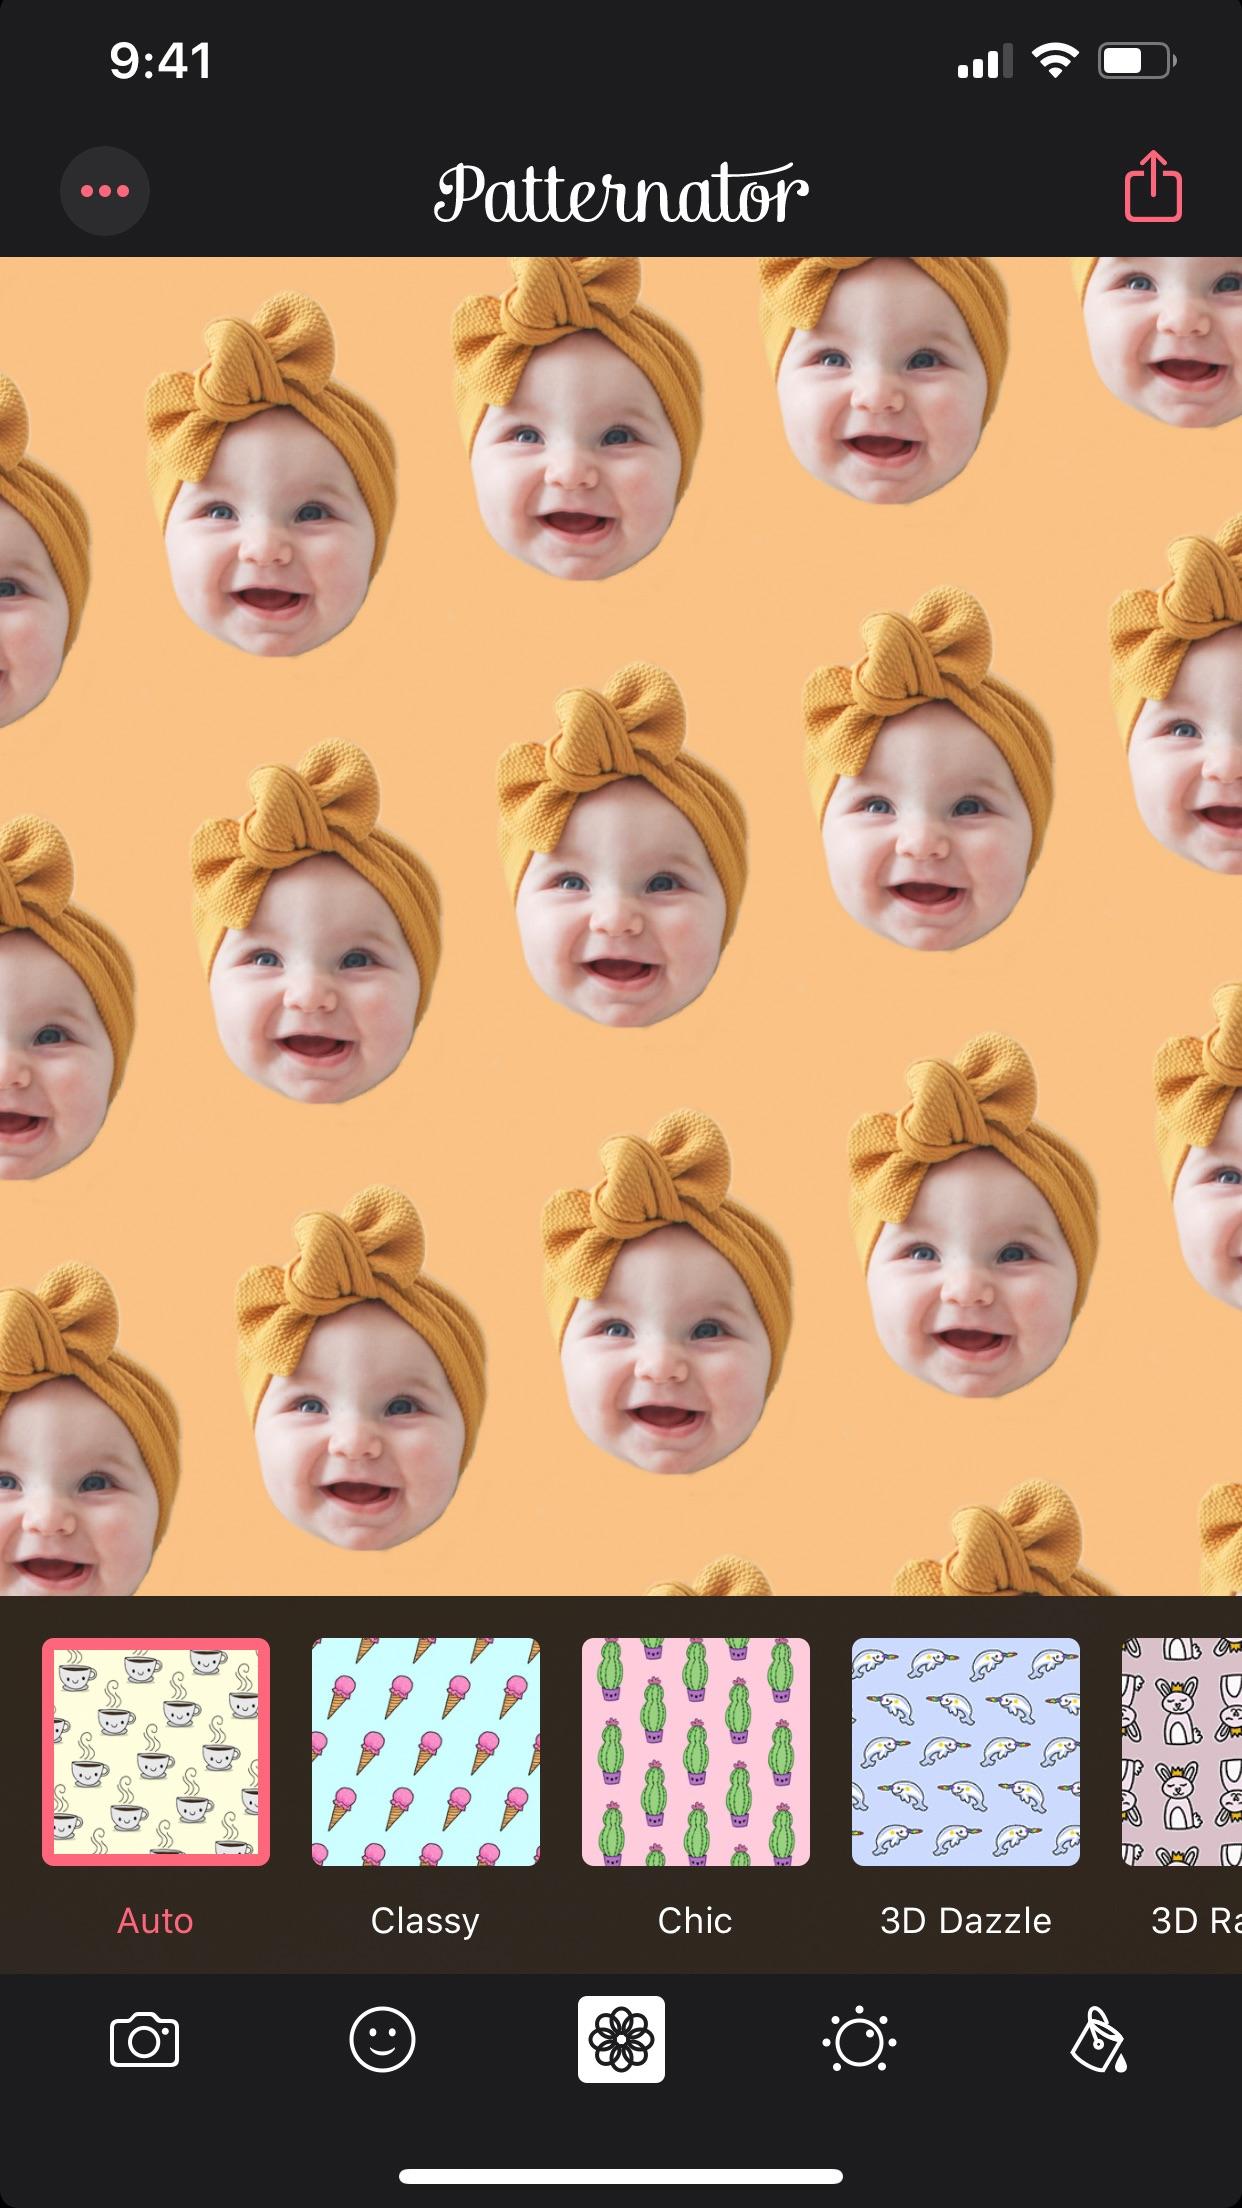 Patternator Video Wallpaper 4K Screenshot